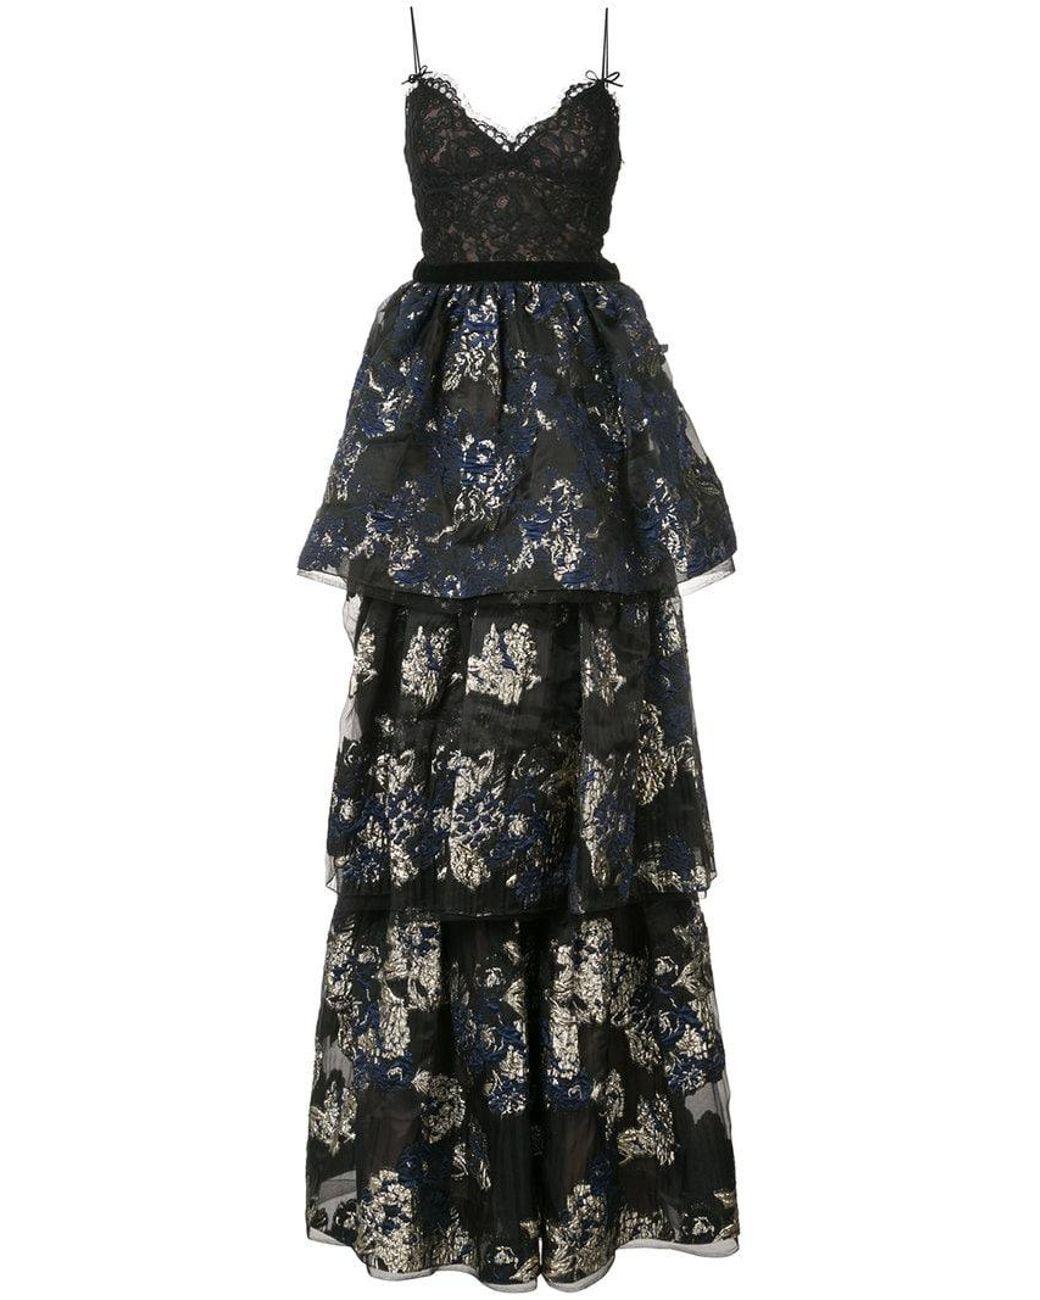 bc680f23d6e Marchesa notte Layered Skirt Evening Dress in Black - Lyst